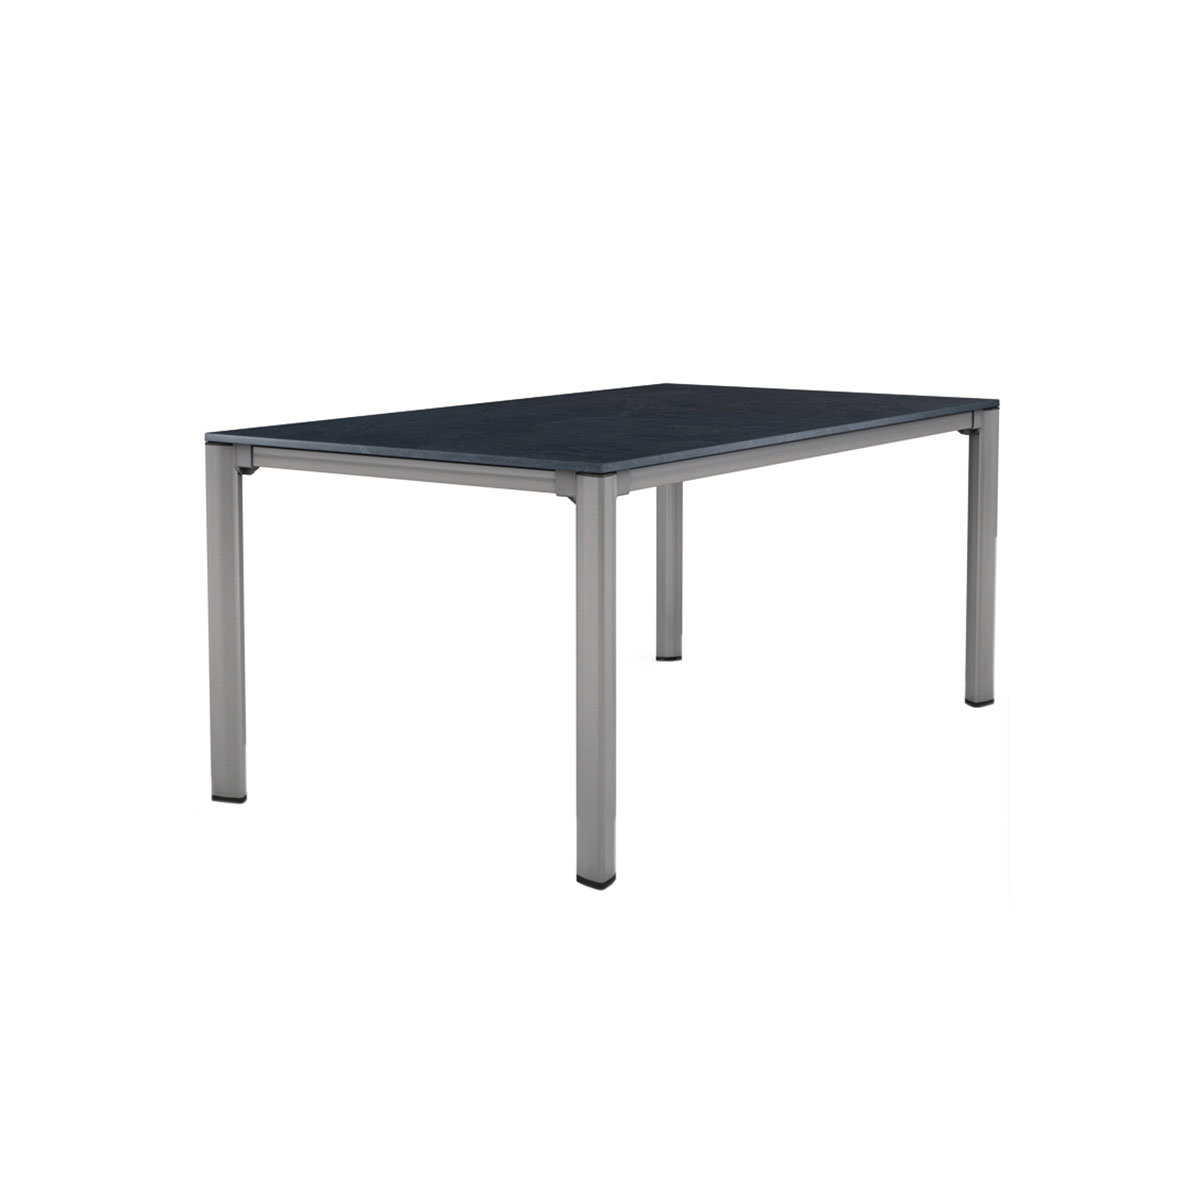 Garten-Tisch Moderno